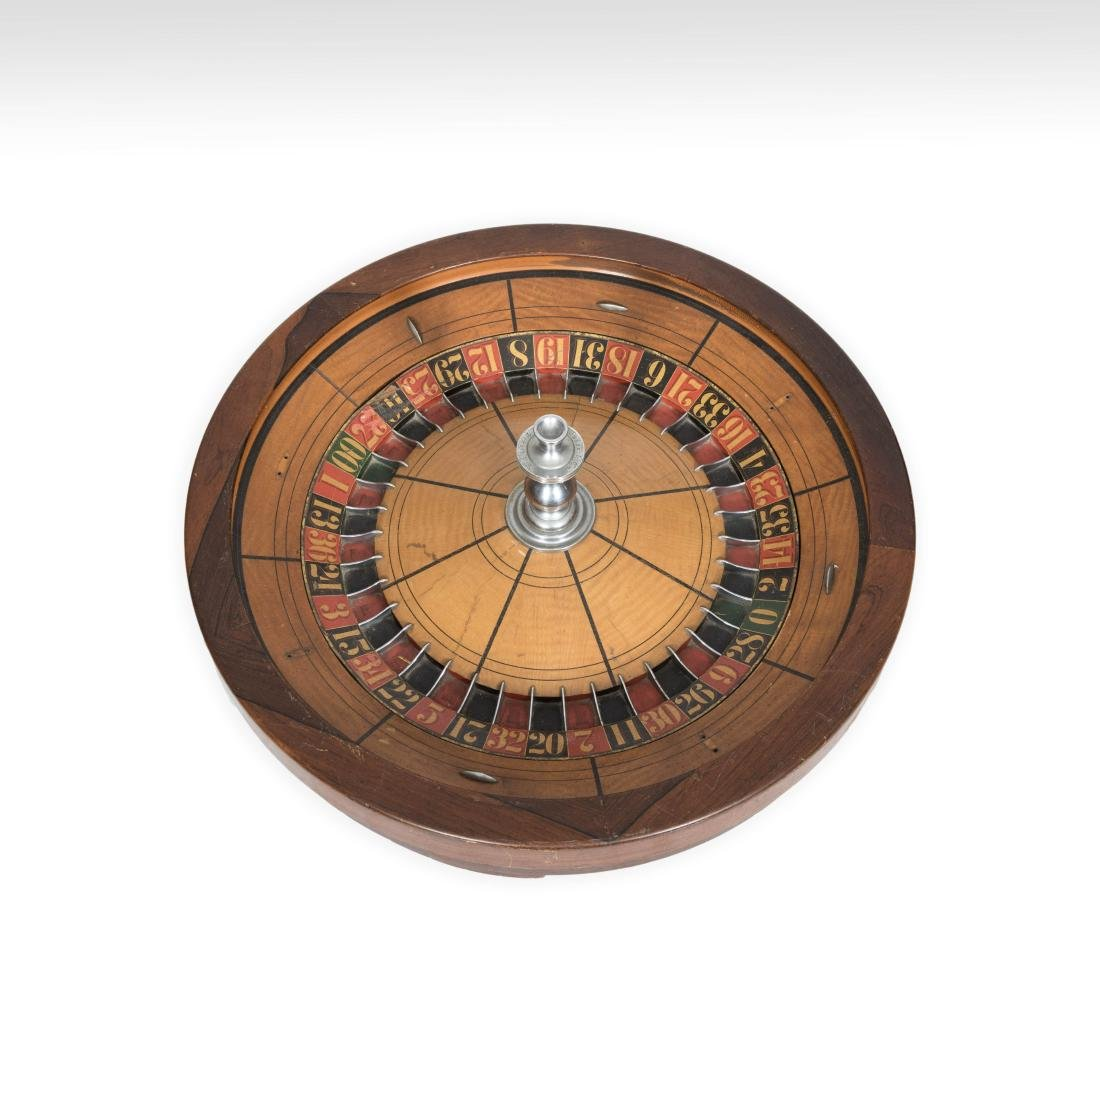 Large Roulette Wheel